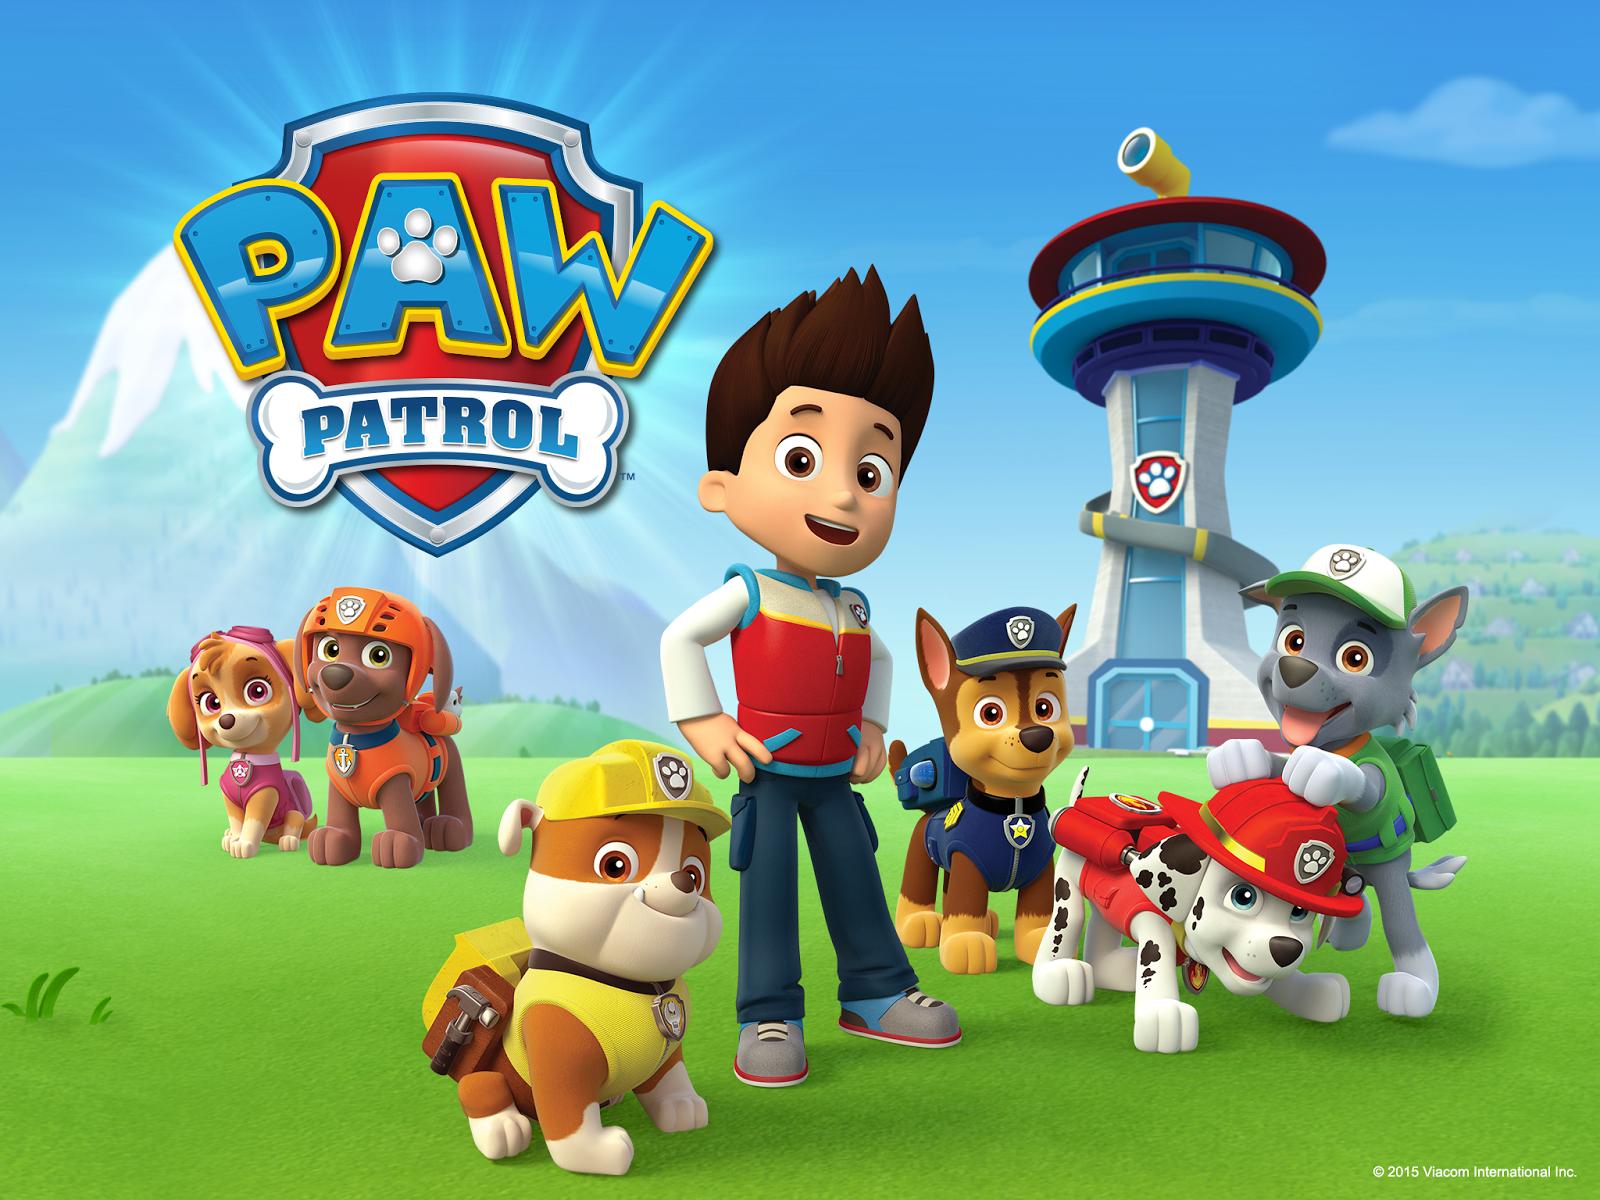 Paw Patrol Backgrounds HQ Pierre Oritz